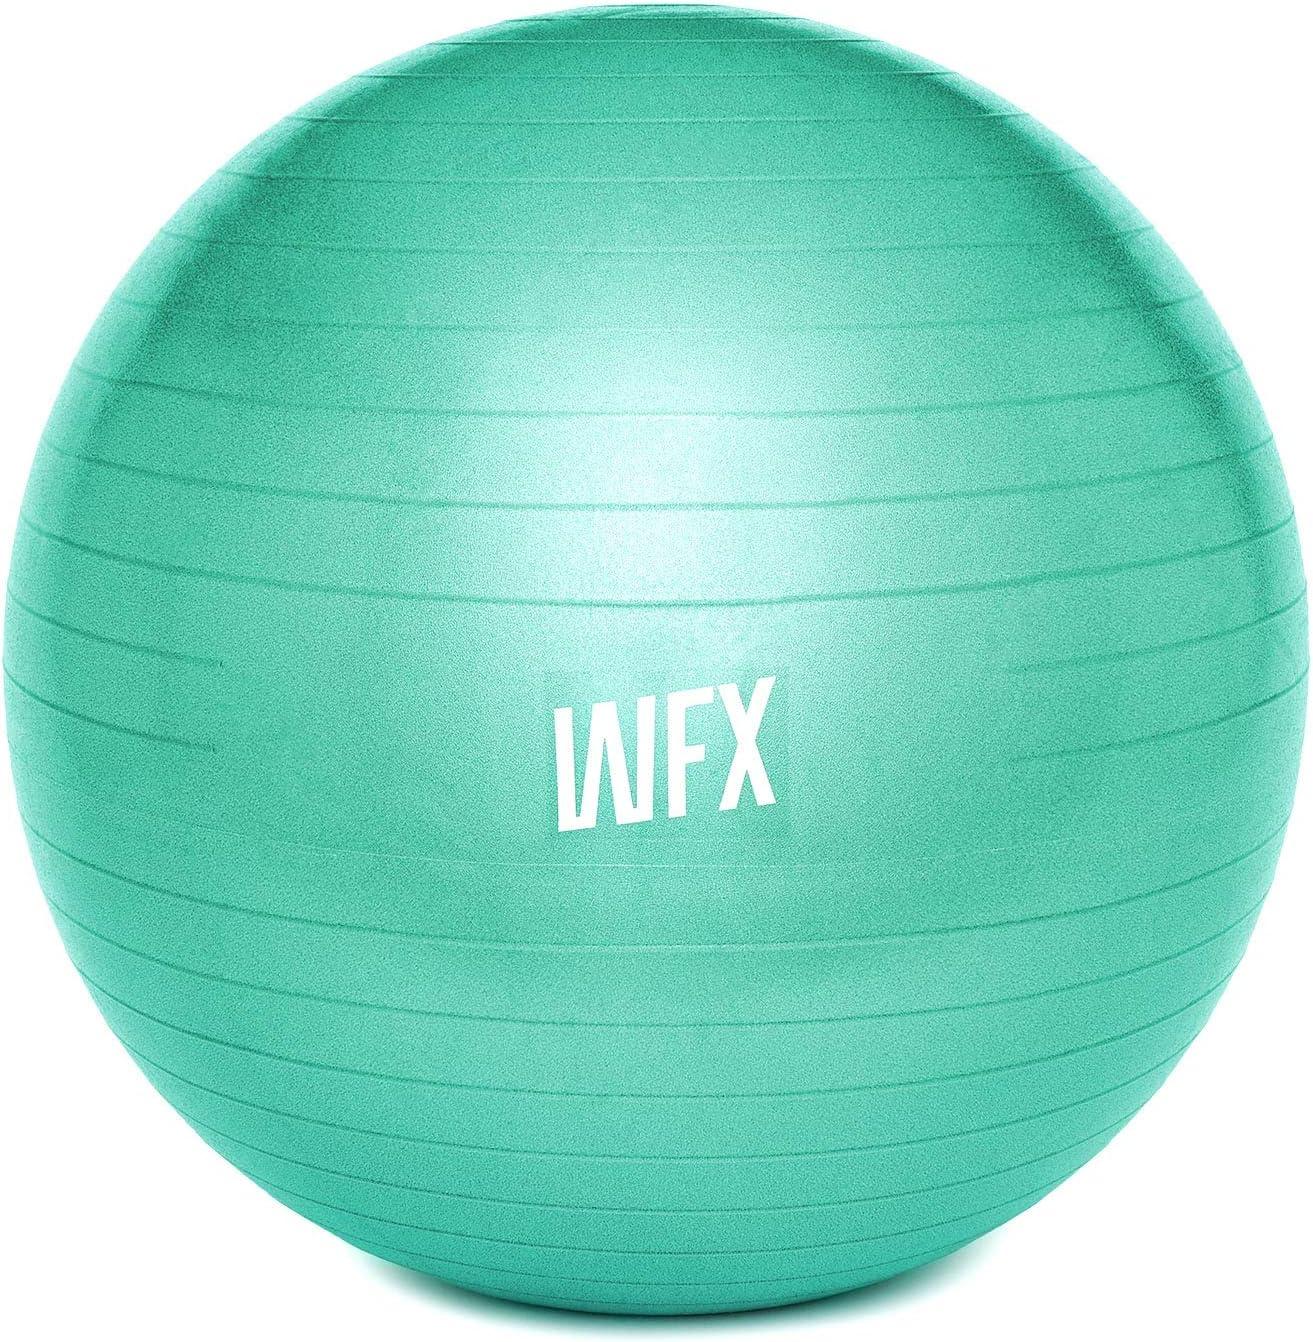 100/% Berstsicher robuster Sitzball #DoYourFitness/® x Joyletics Gymnastikball inkl /& Luftpumpe Fitnessball 85cm B/ürostuhl 150kg Belastbarkeit 55cm 65cm 75cm o